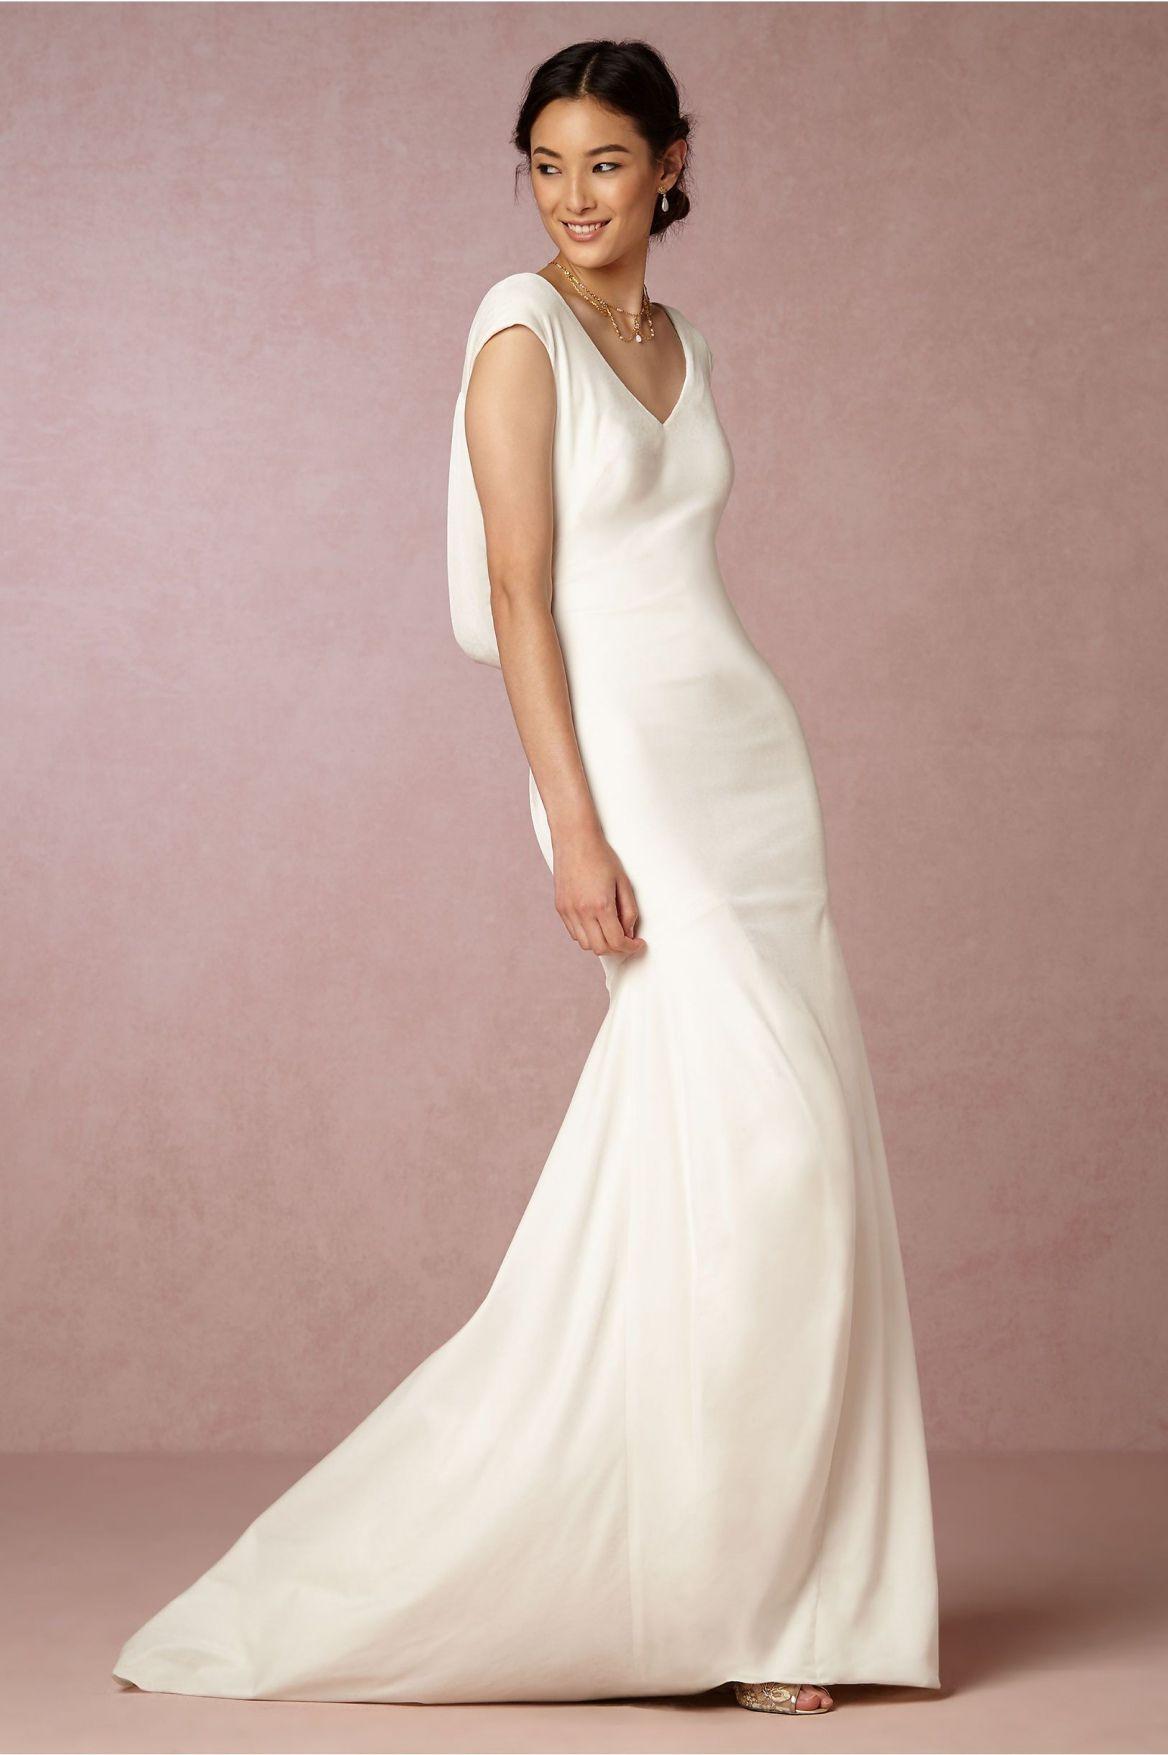 70+ Velvet Wedding Dress - Wedding Dresses for Guests Check more at ...